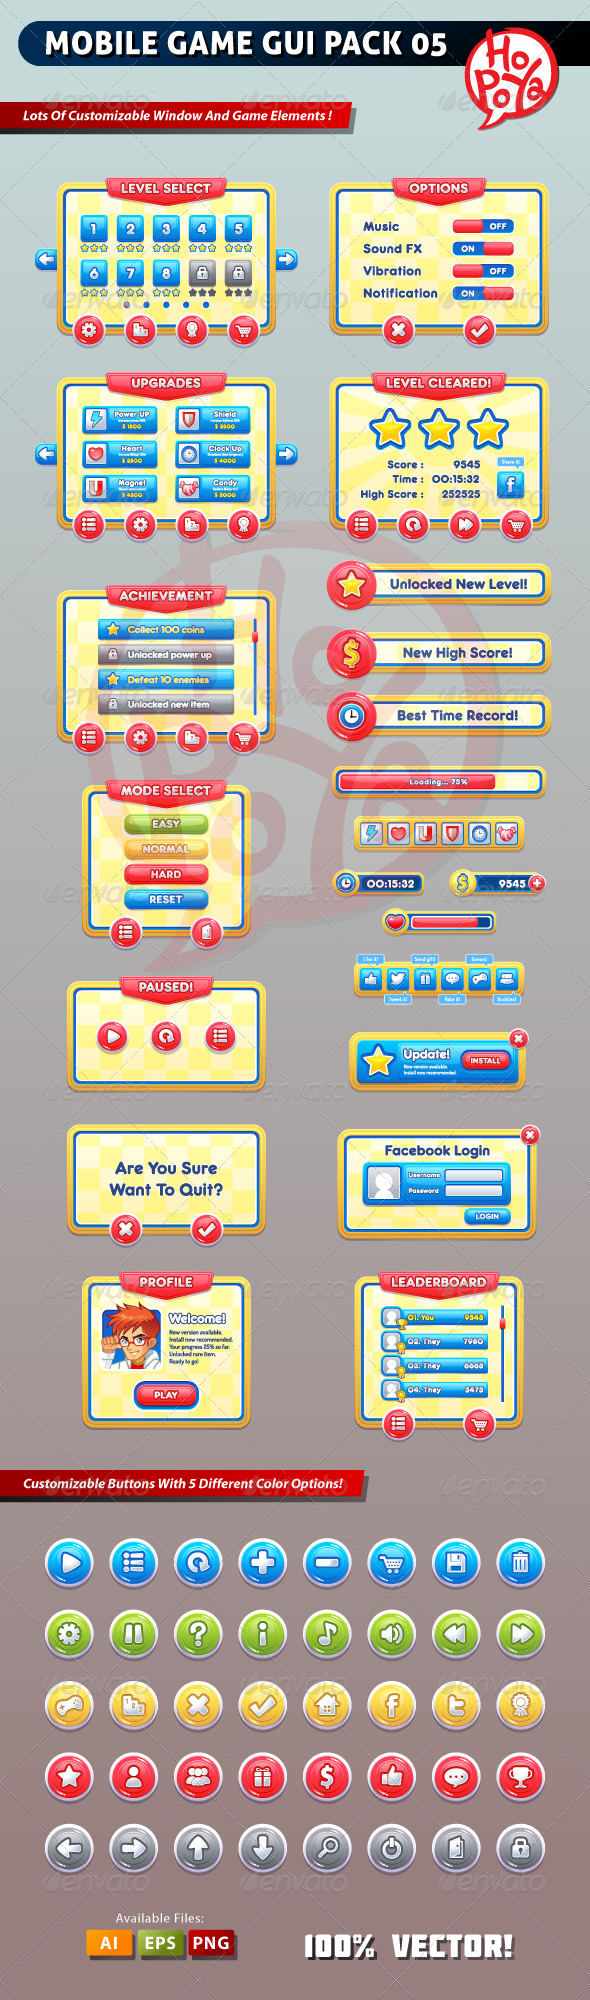 Mobile Game GUI Pack 05 - Web Elements Vectors